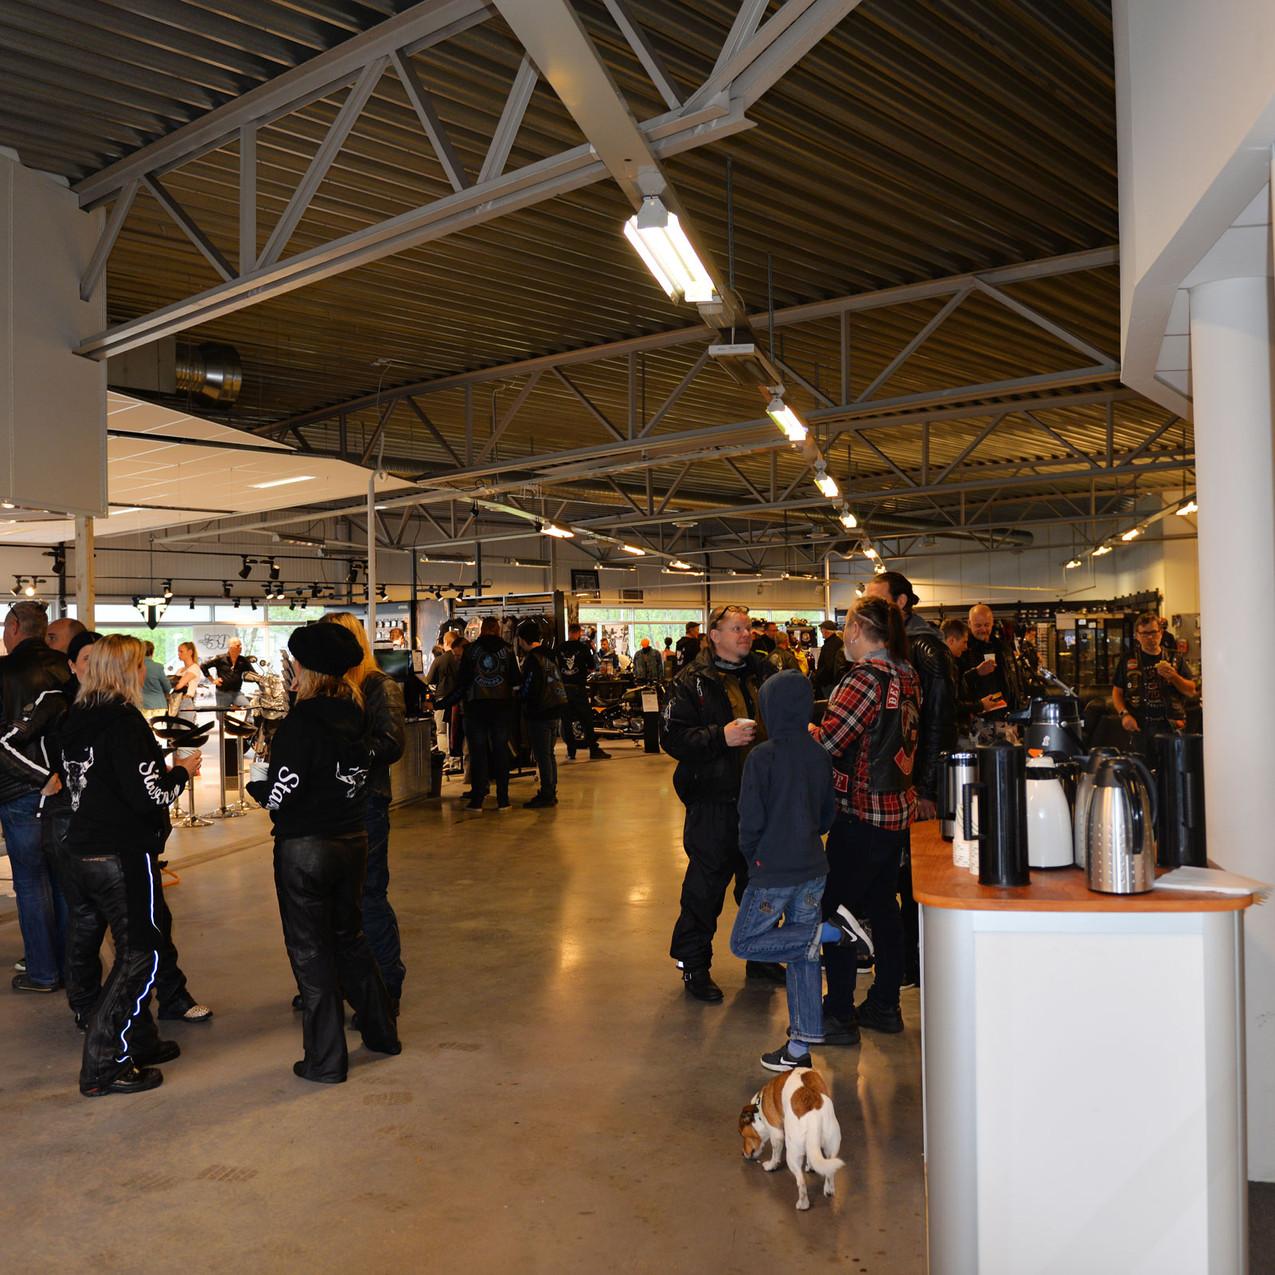 MC-interessen er stigende i Rogaland. Det var utrolig mange som kom innom den nye butikken i Sandnes.